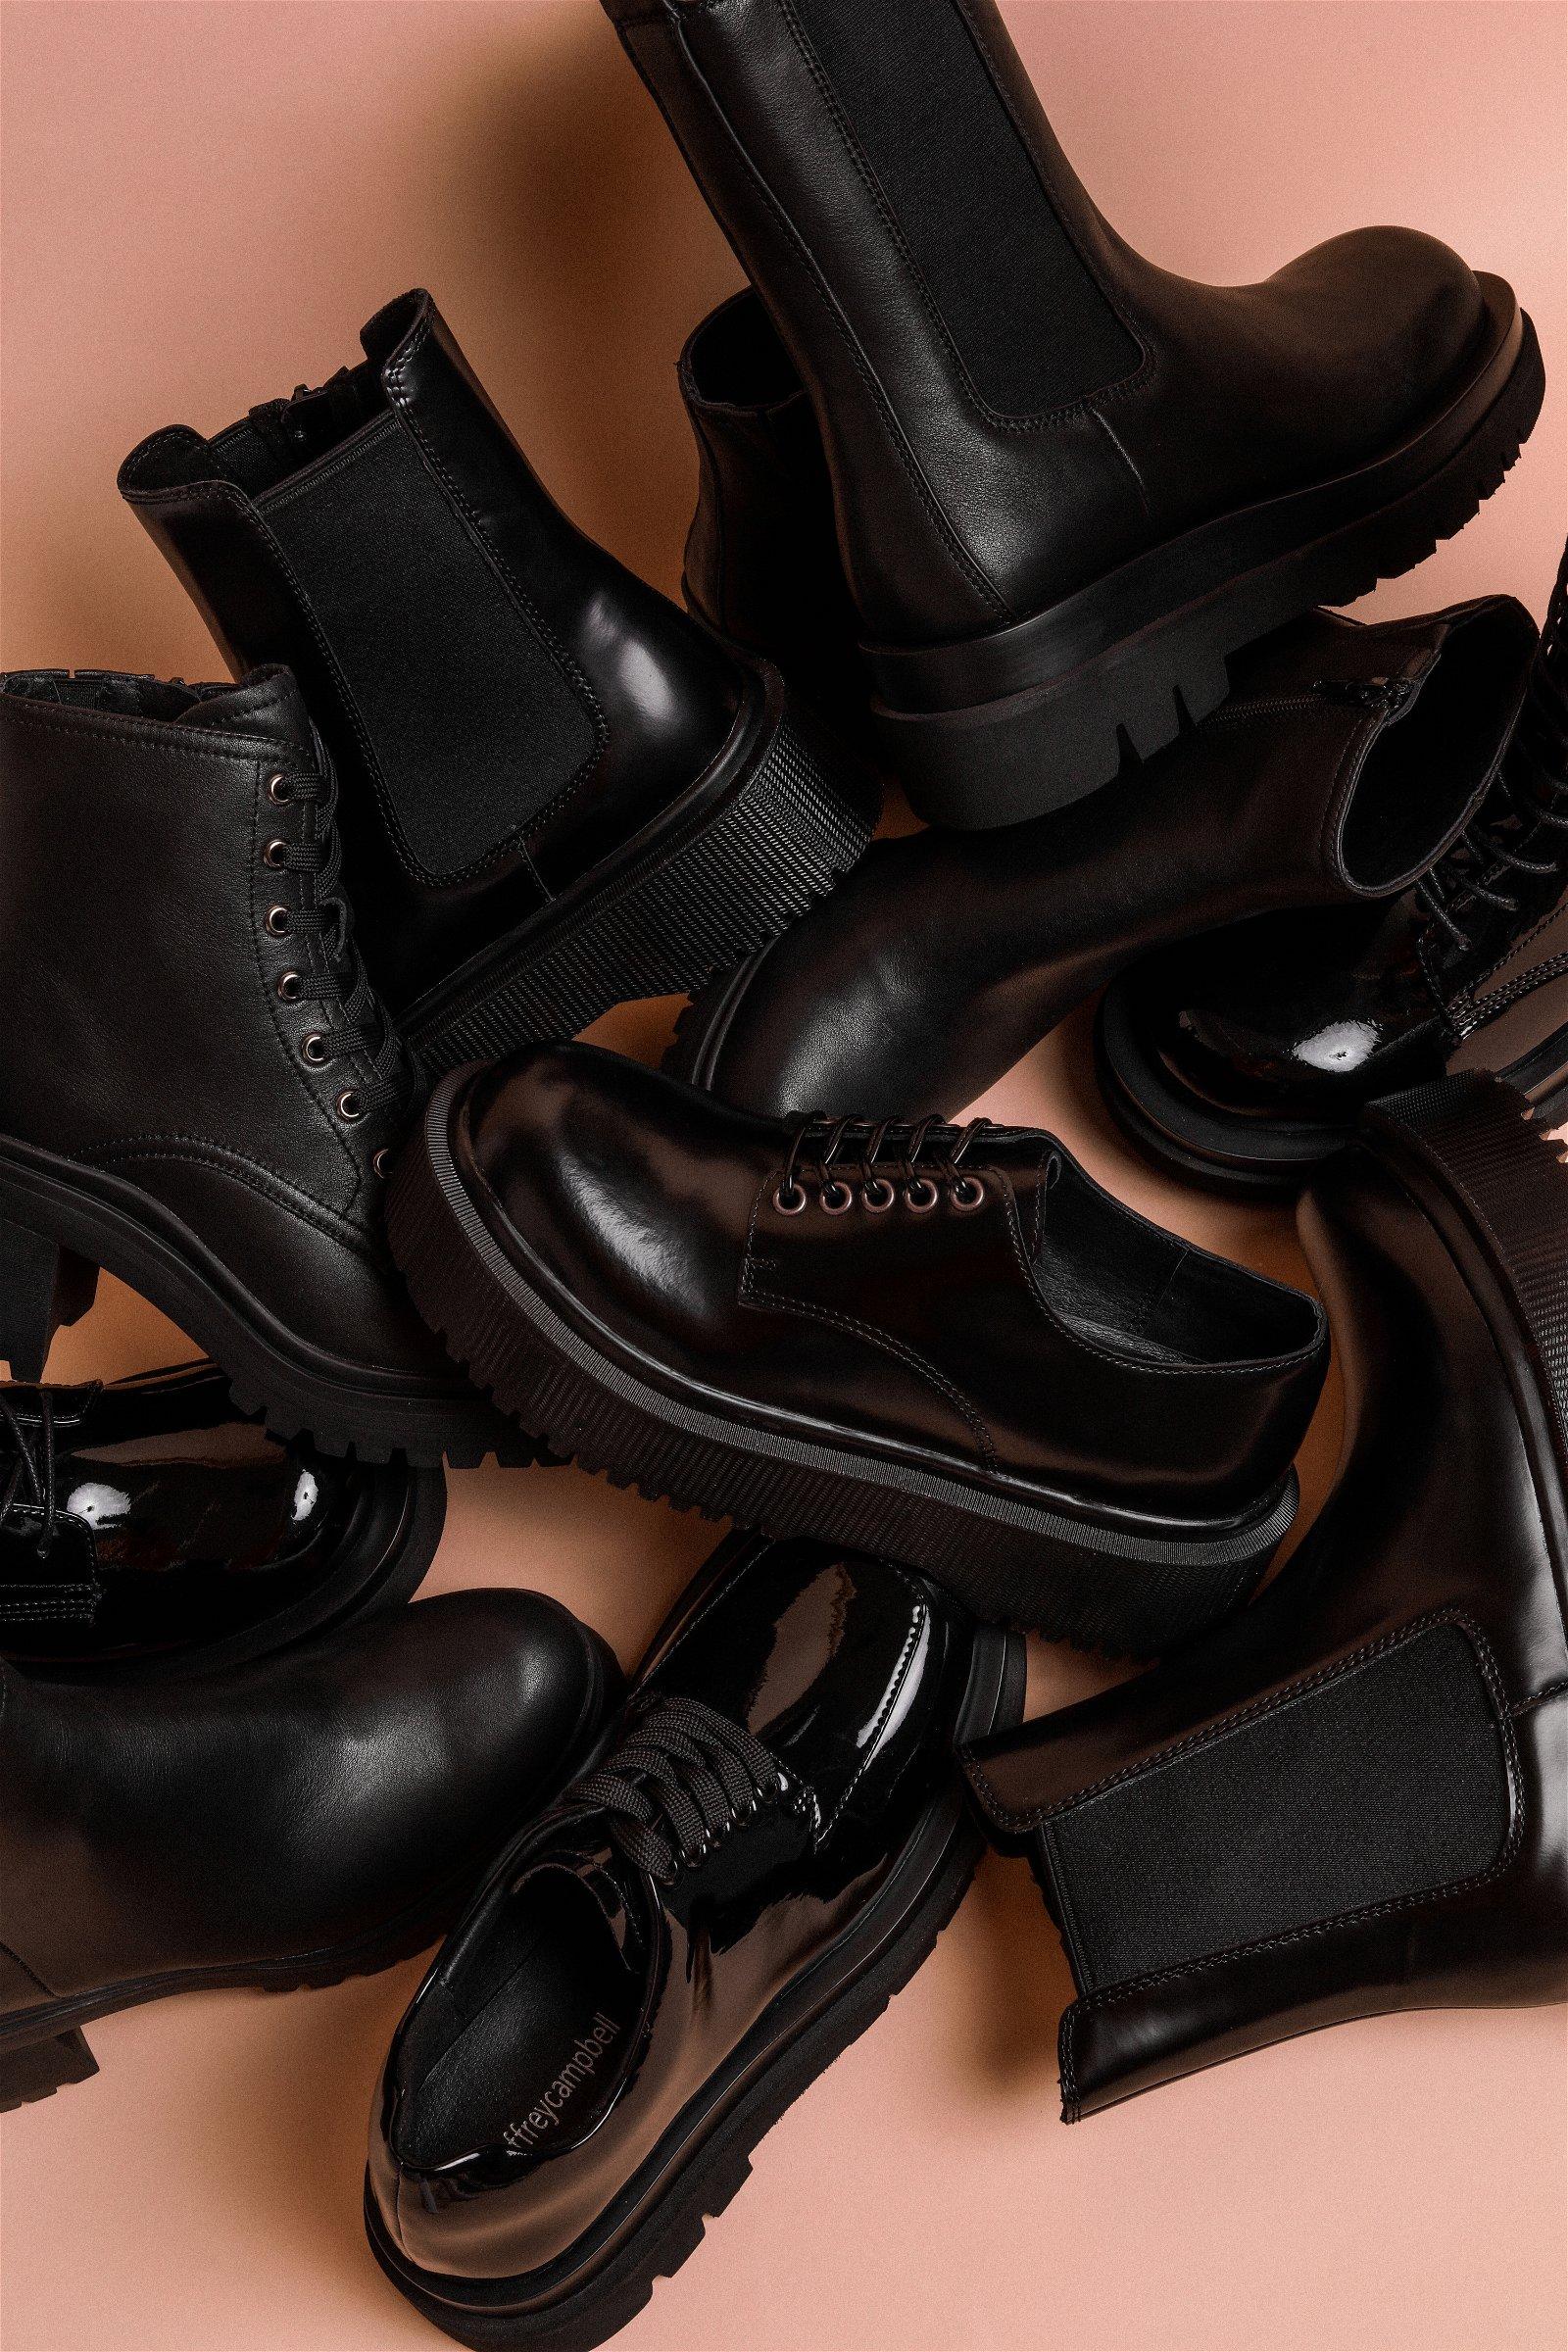 Jeffrey Campbell Shoes: NEW Lug Sole